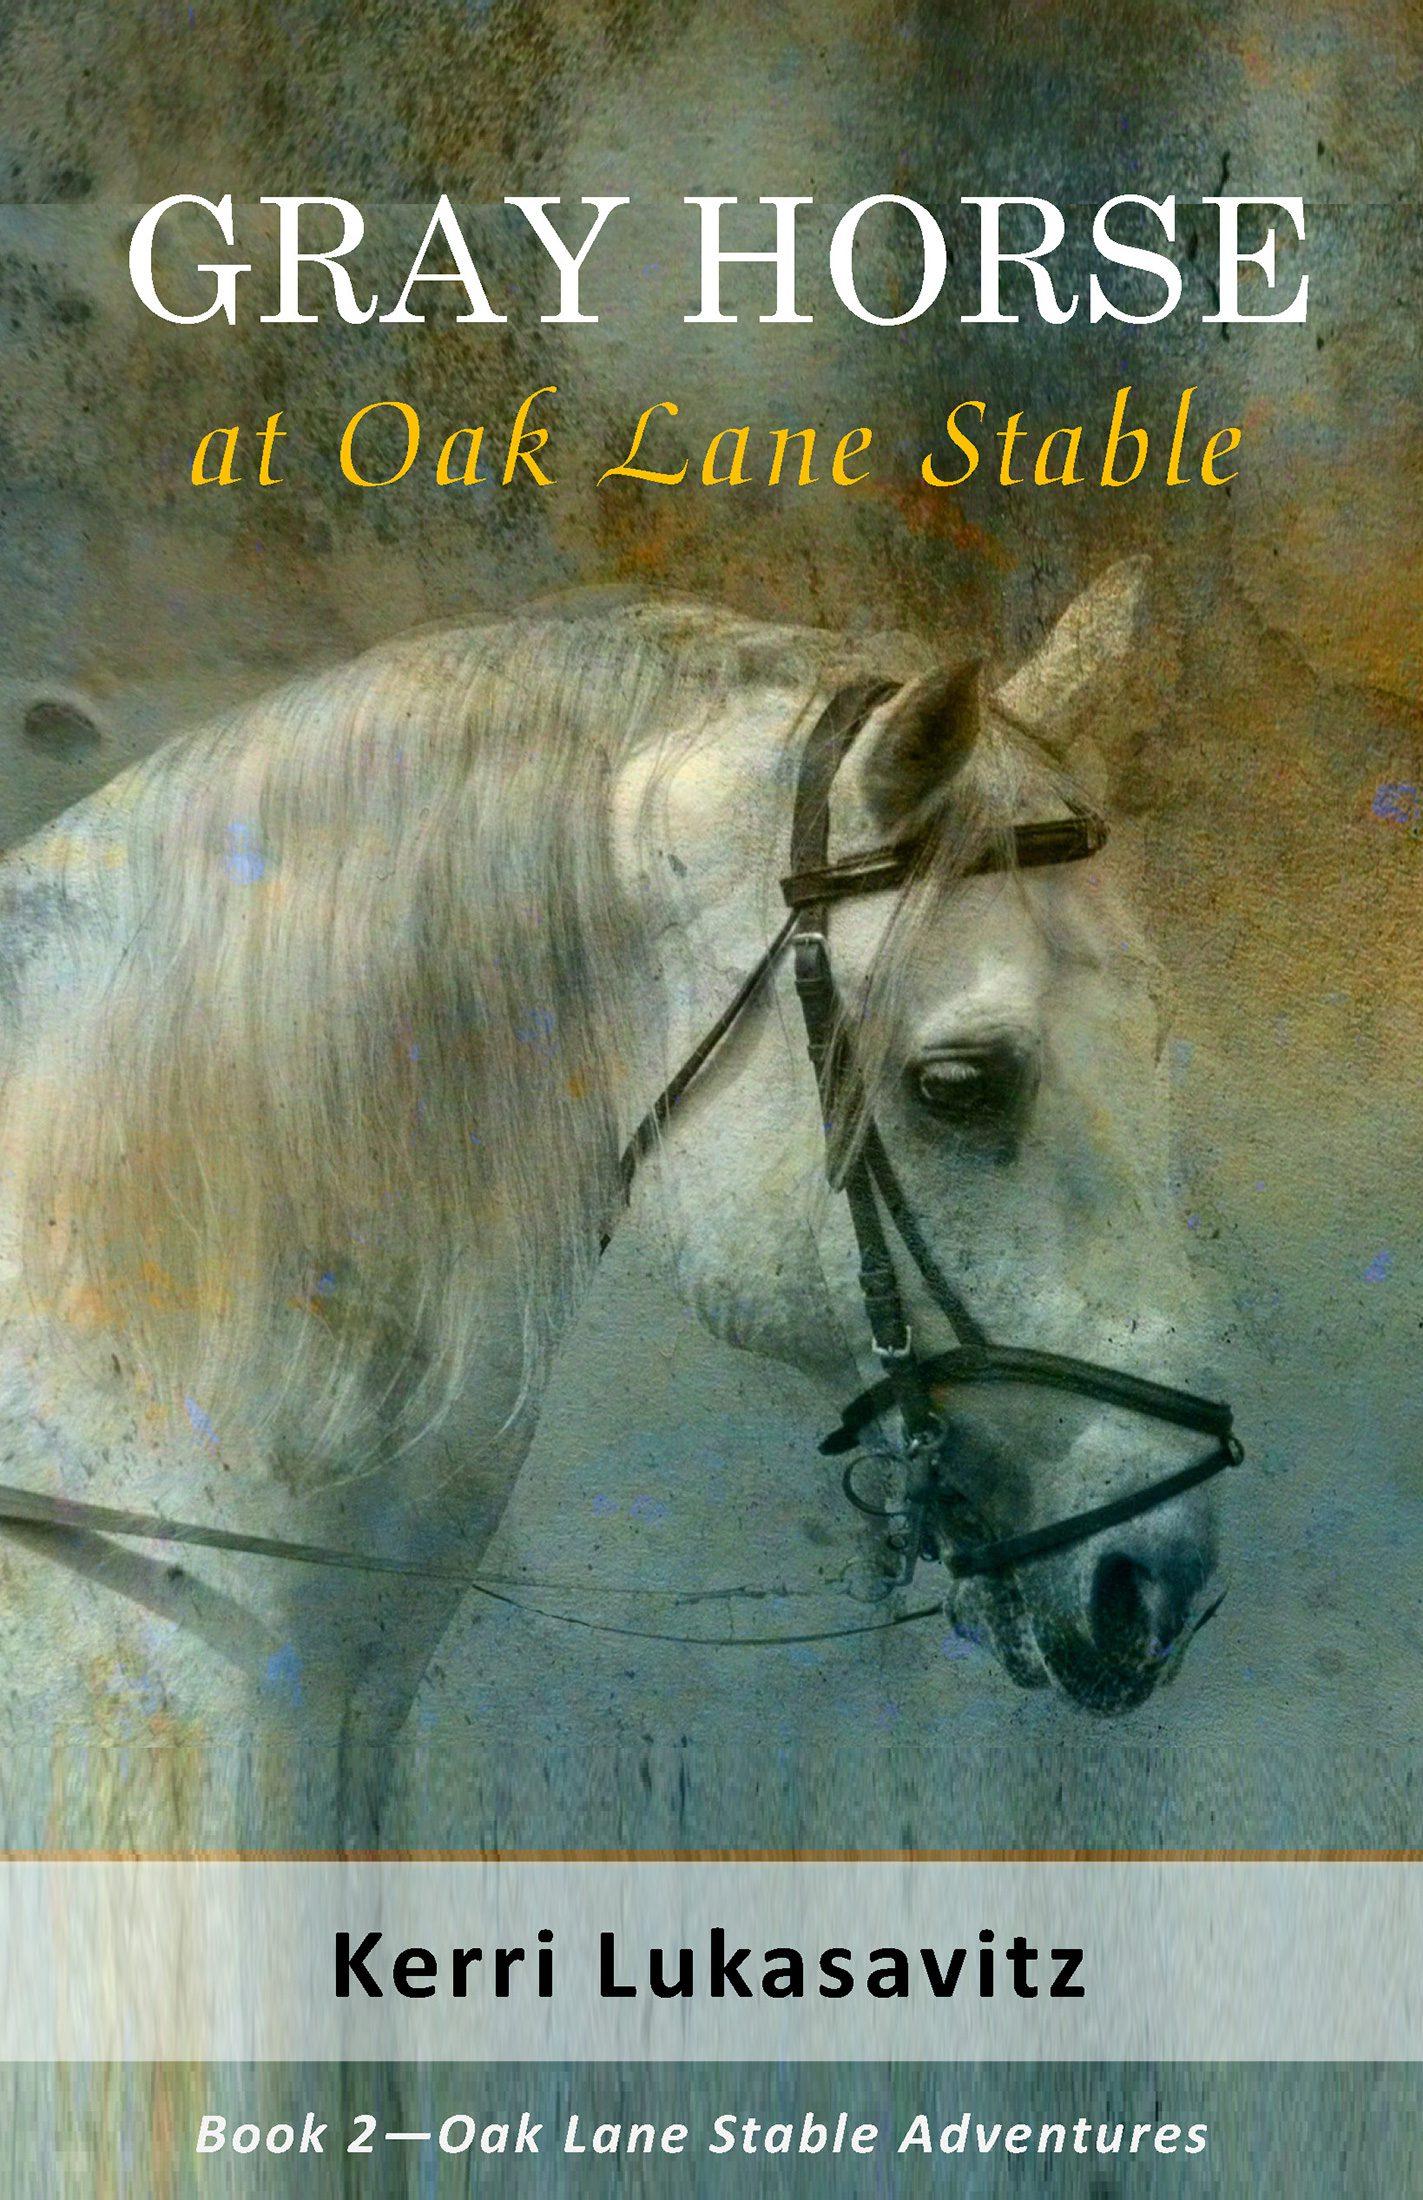 Gray Horse at Oak Lane Stables